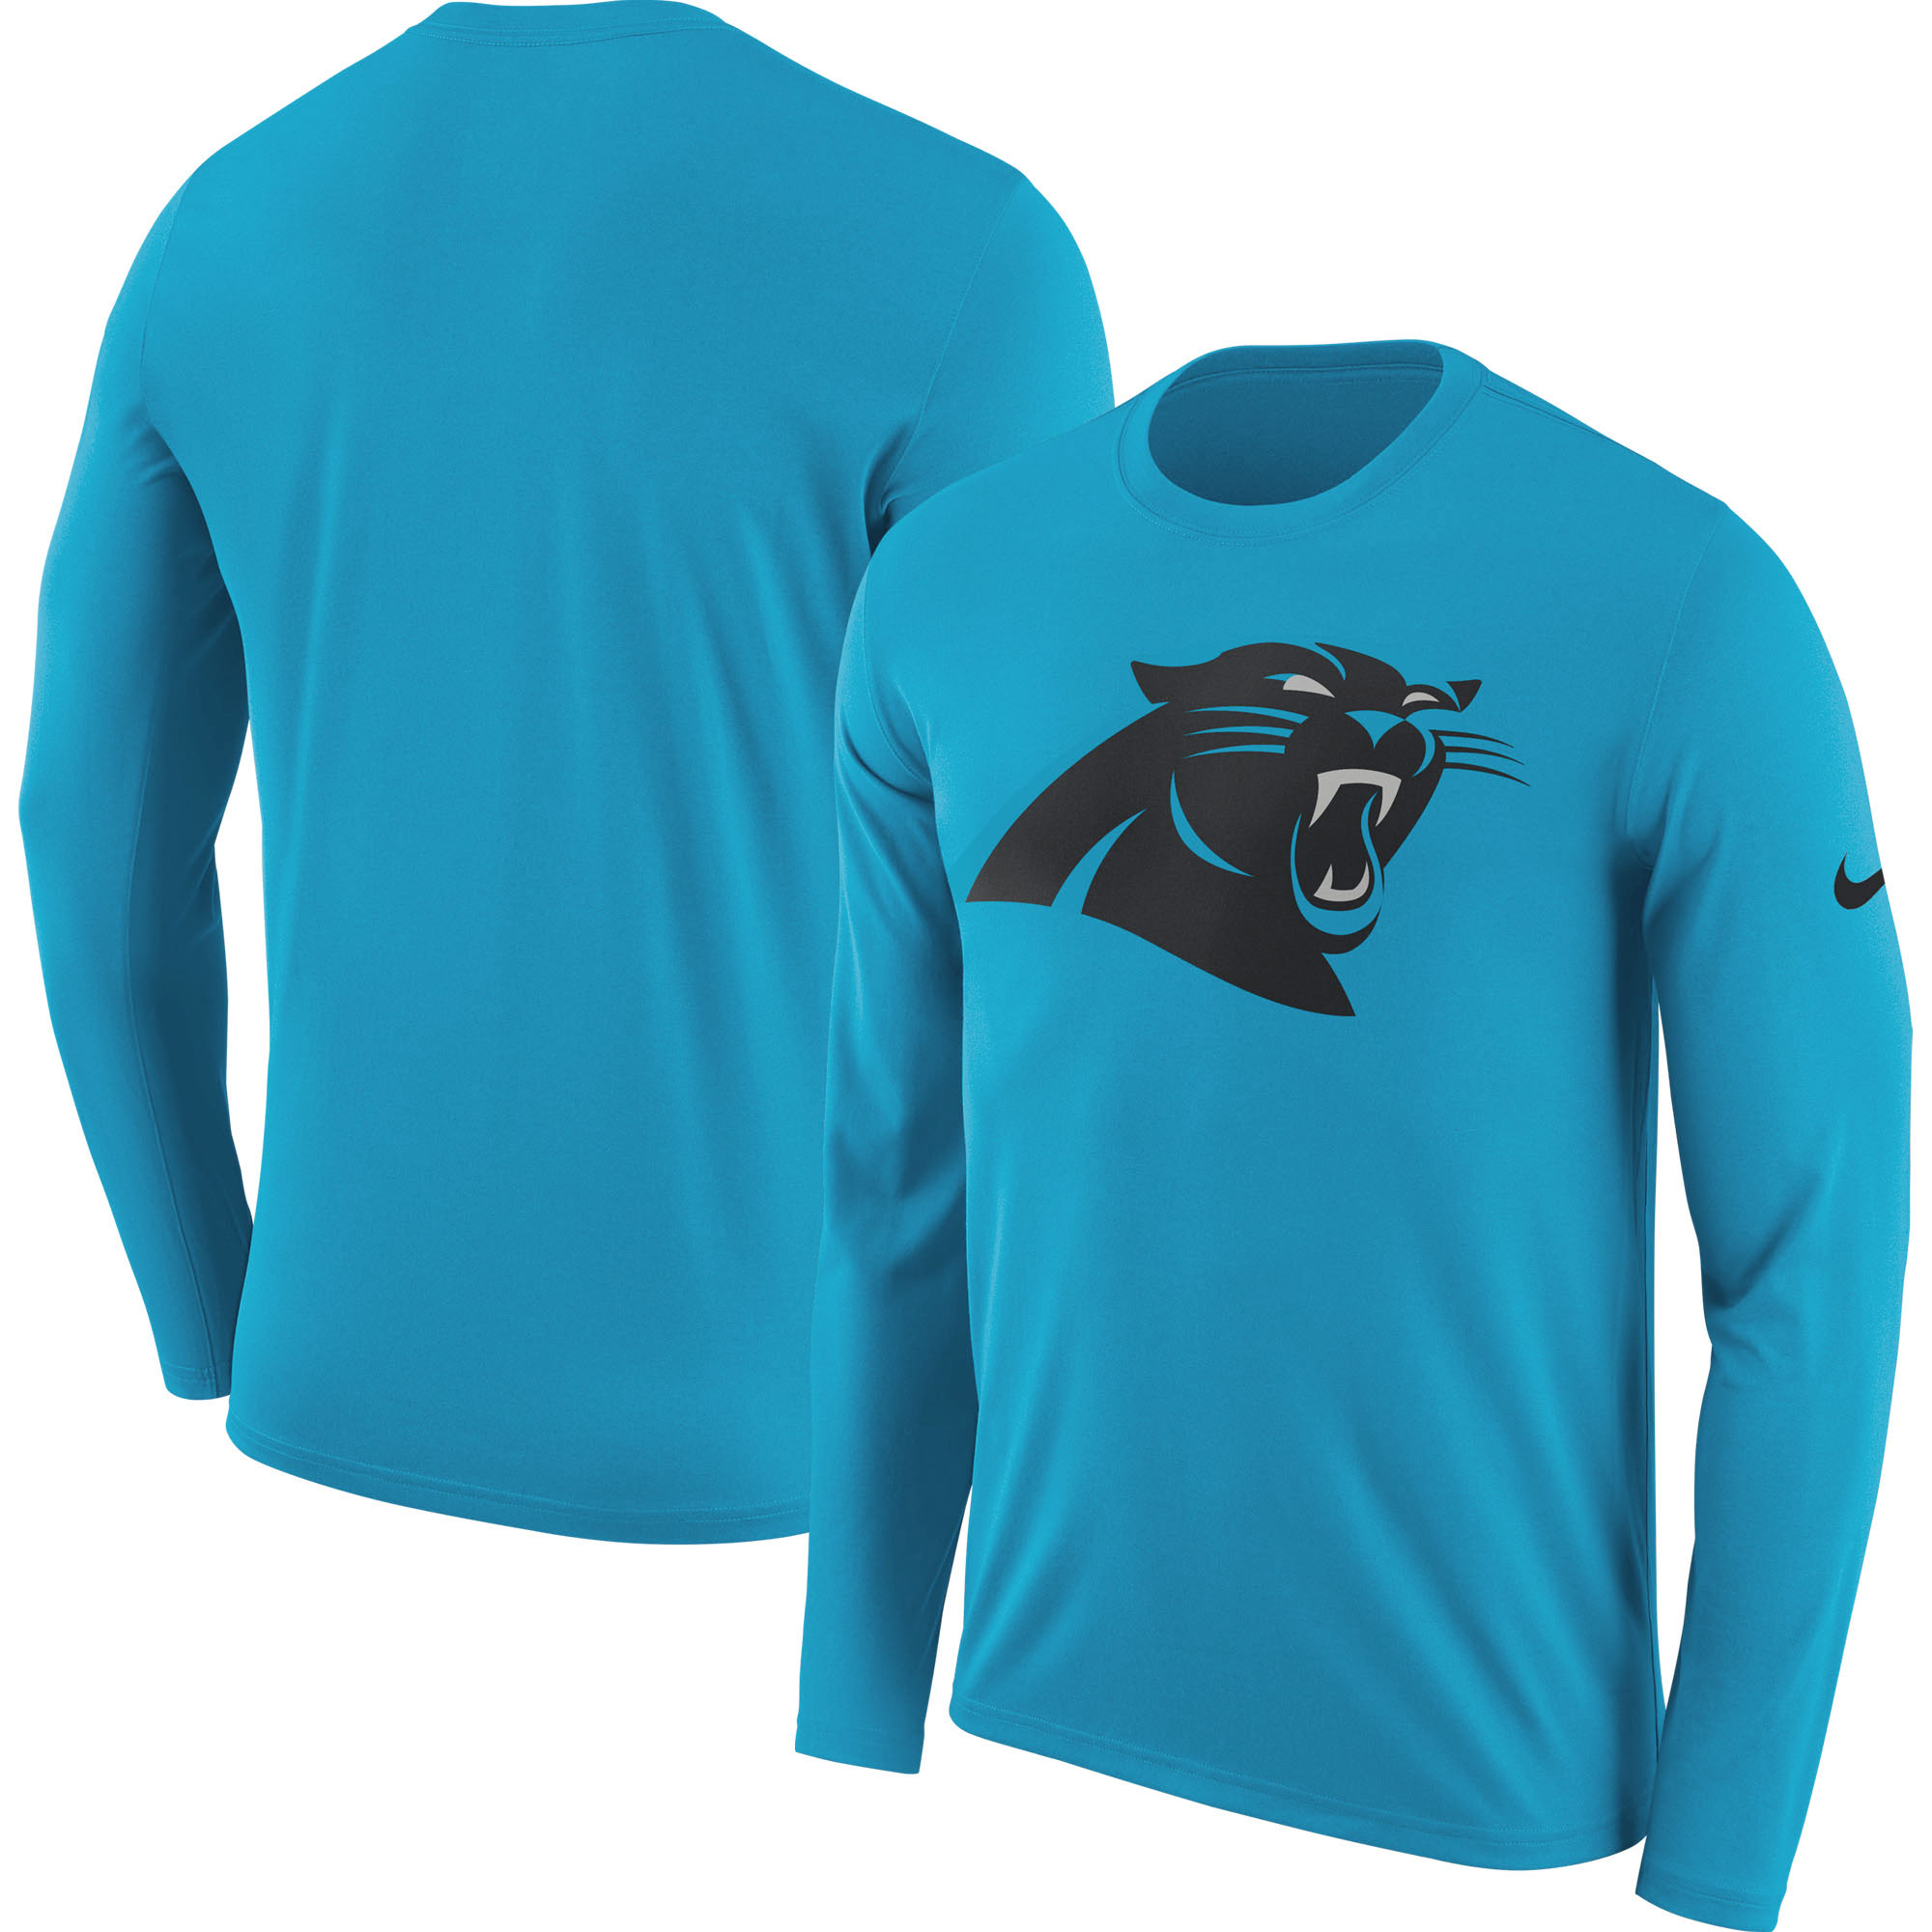 Carolina Panthers Nike Fan Gear Primary Logo Long Sleeve Performance T-Shirt - Blue - 2XL